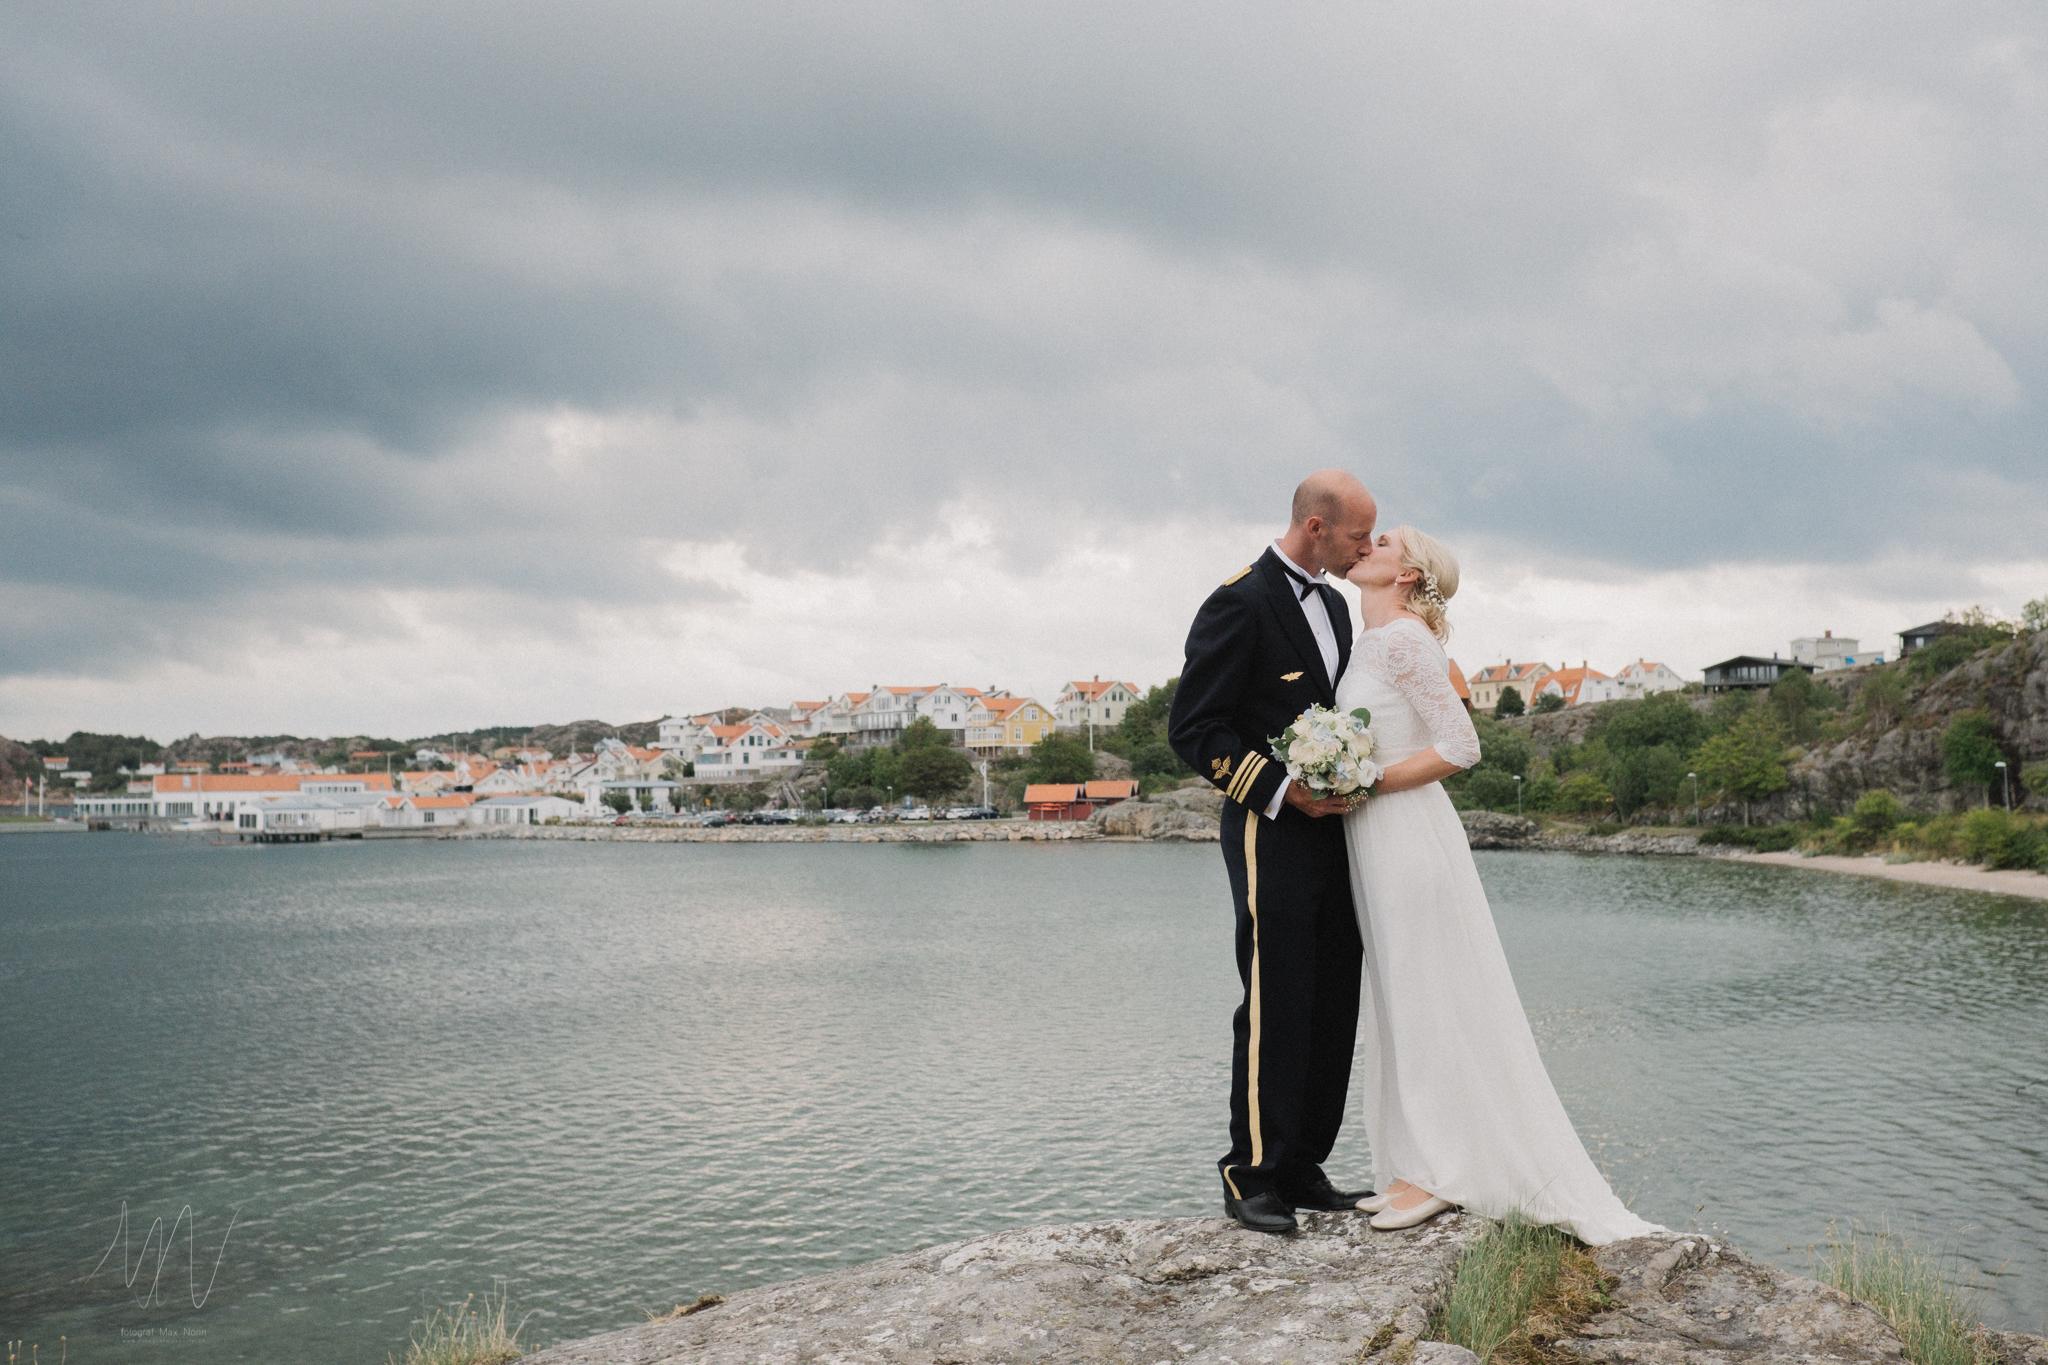 Bröllop-fotografmaxnorin.se-MariaMarcus-388.JPG